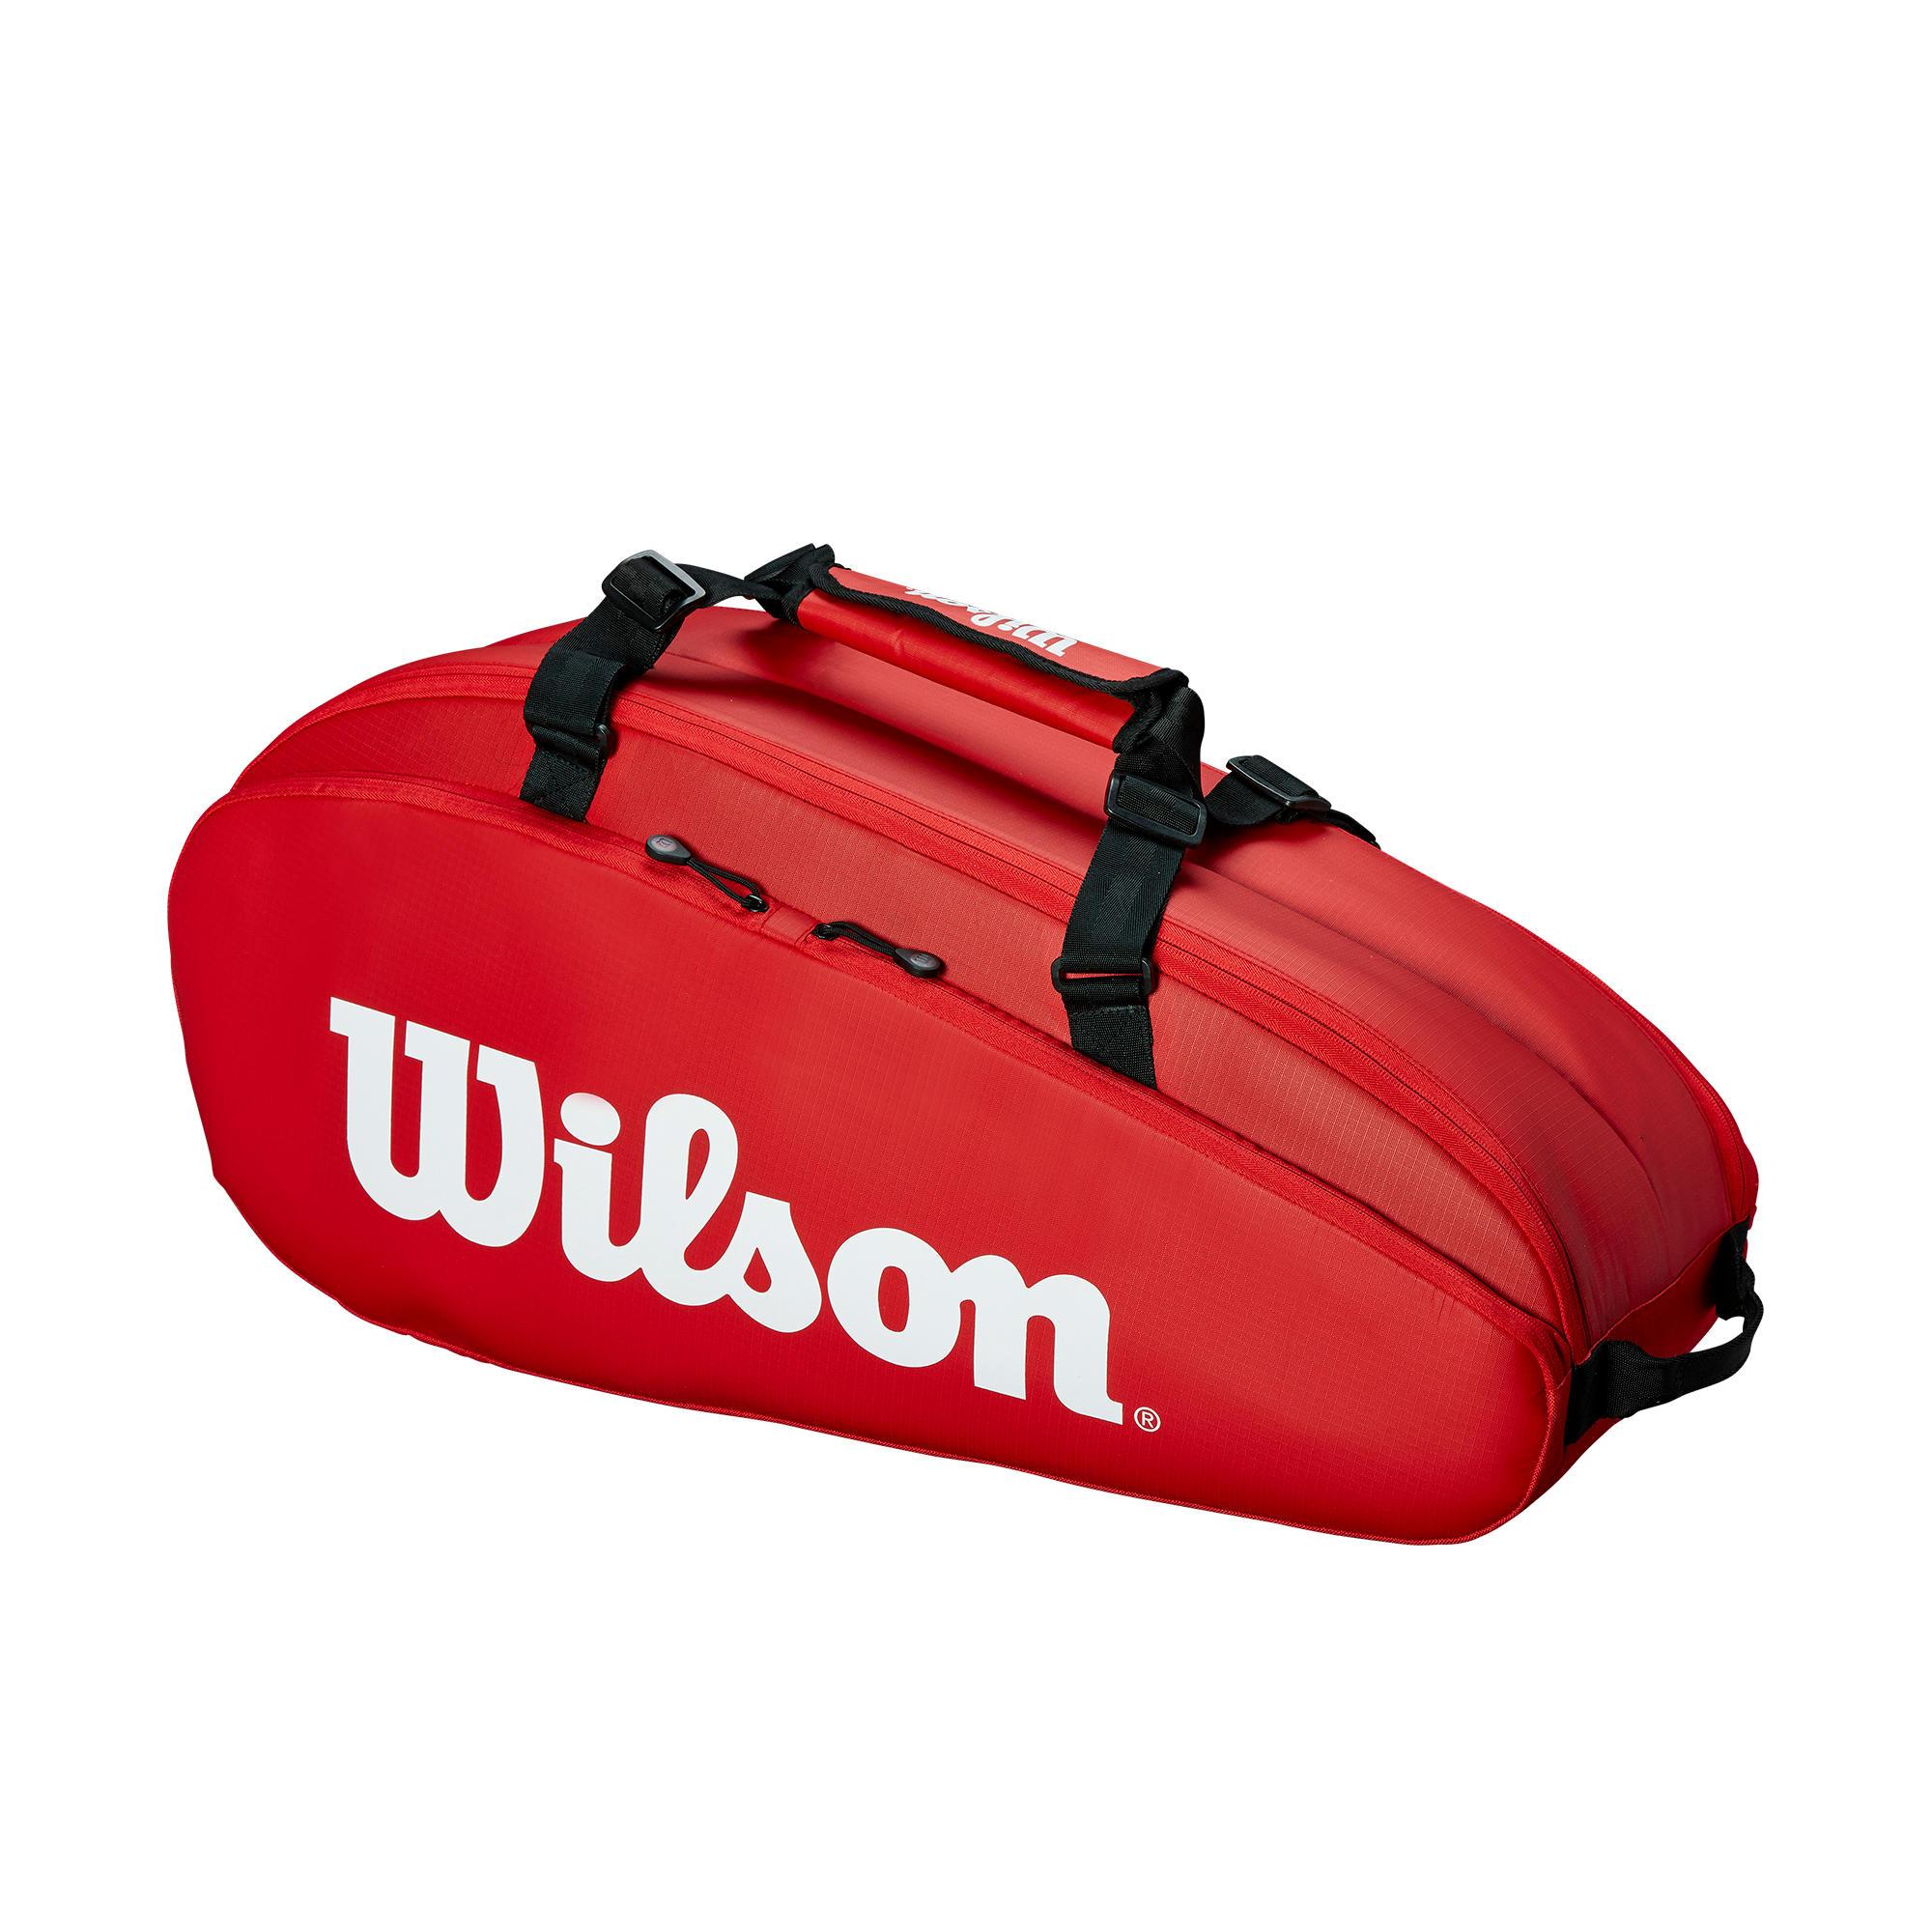 Tennis Bag 6r Red White Wilson Decathlon